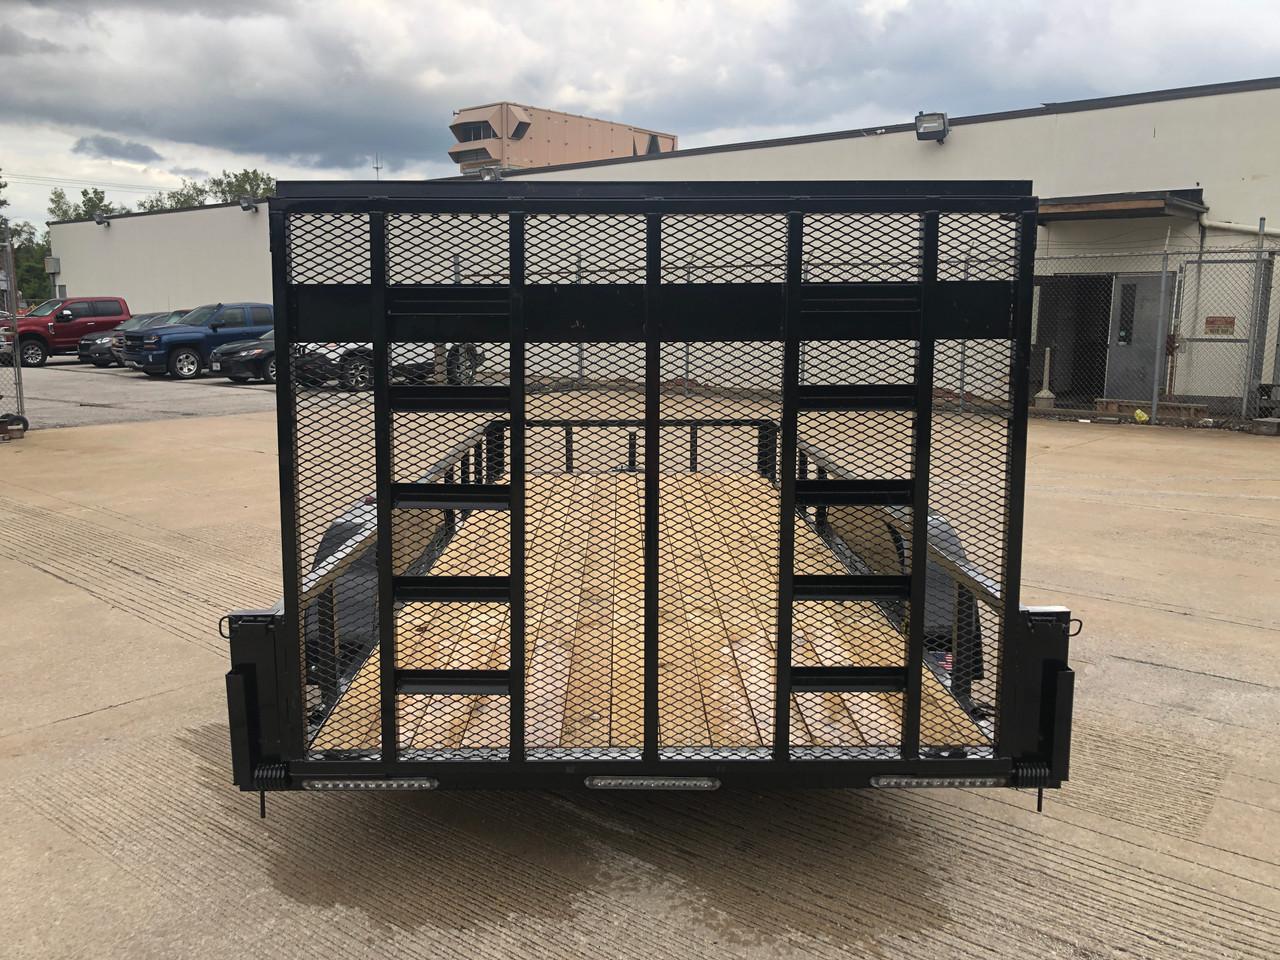 R8216GT-E1 --- 2022 Rhino 80'x16' Tube Top Tandem Axle Utility Trailer #R3080